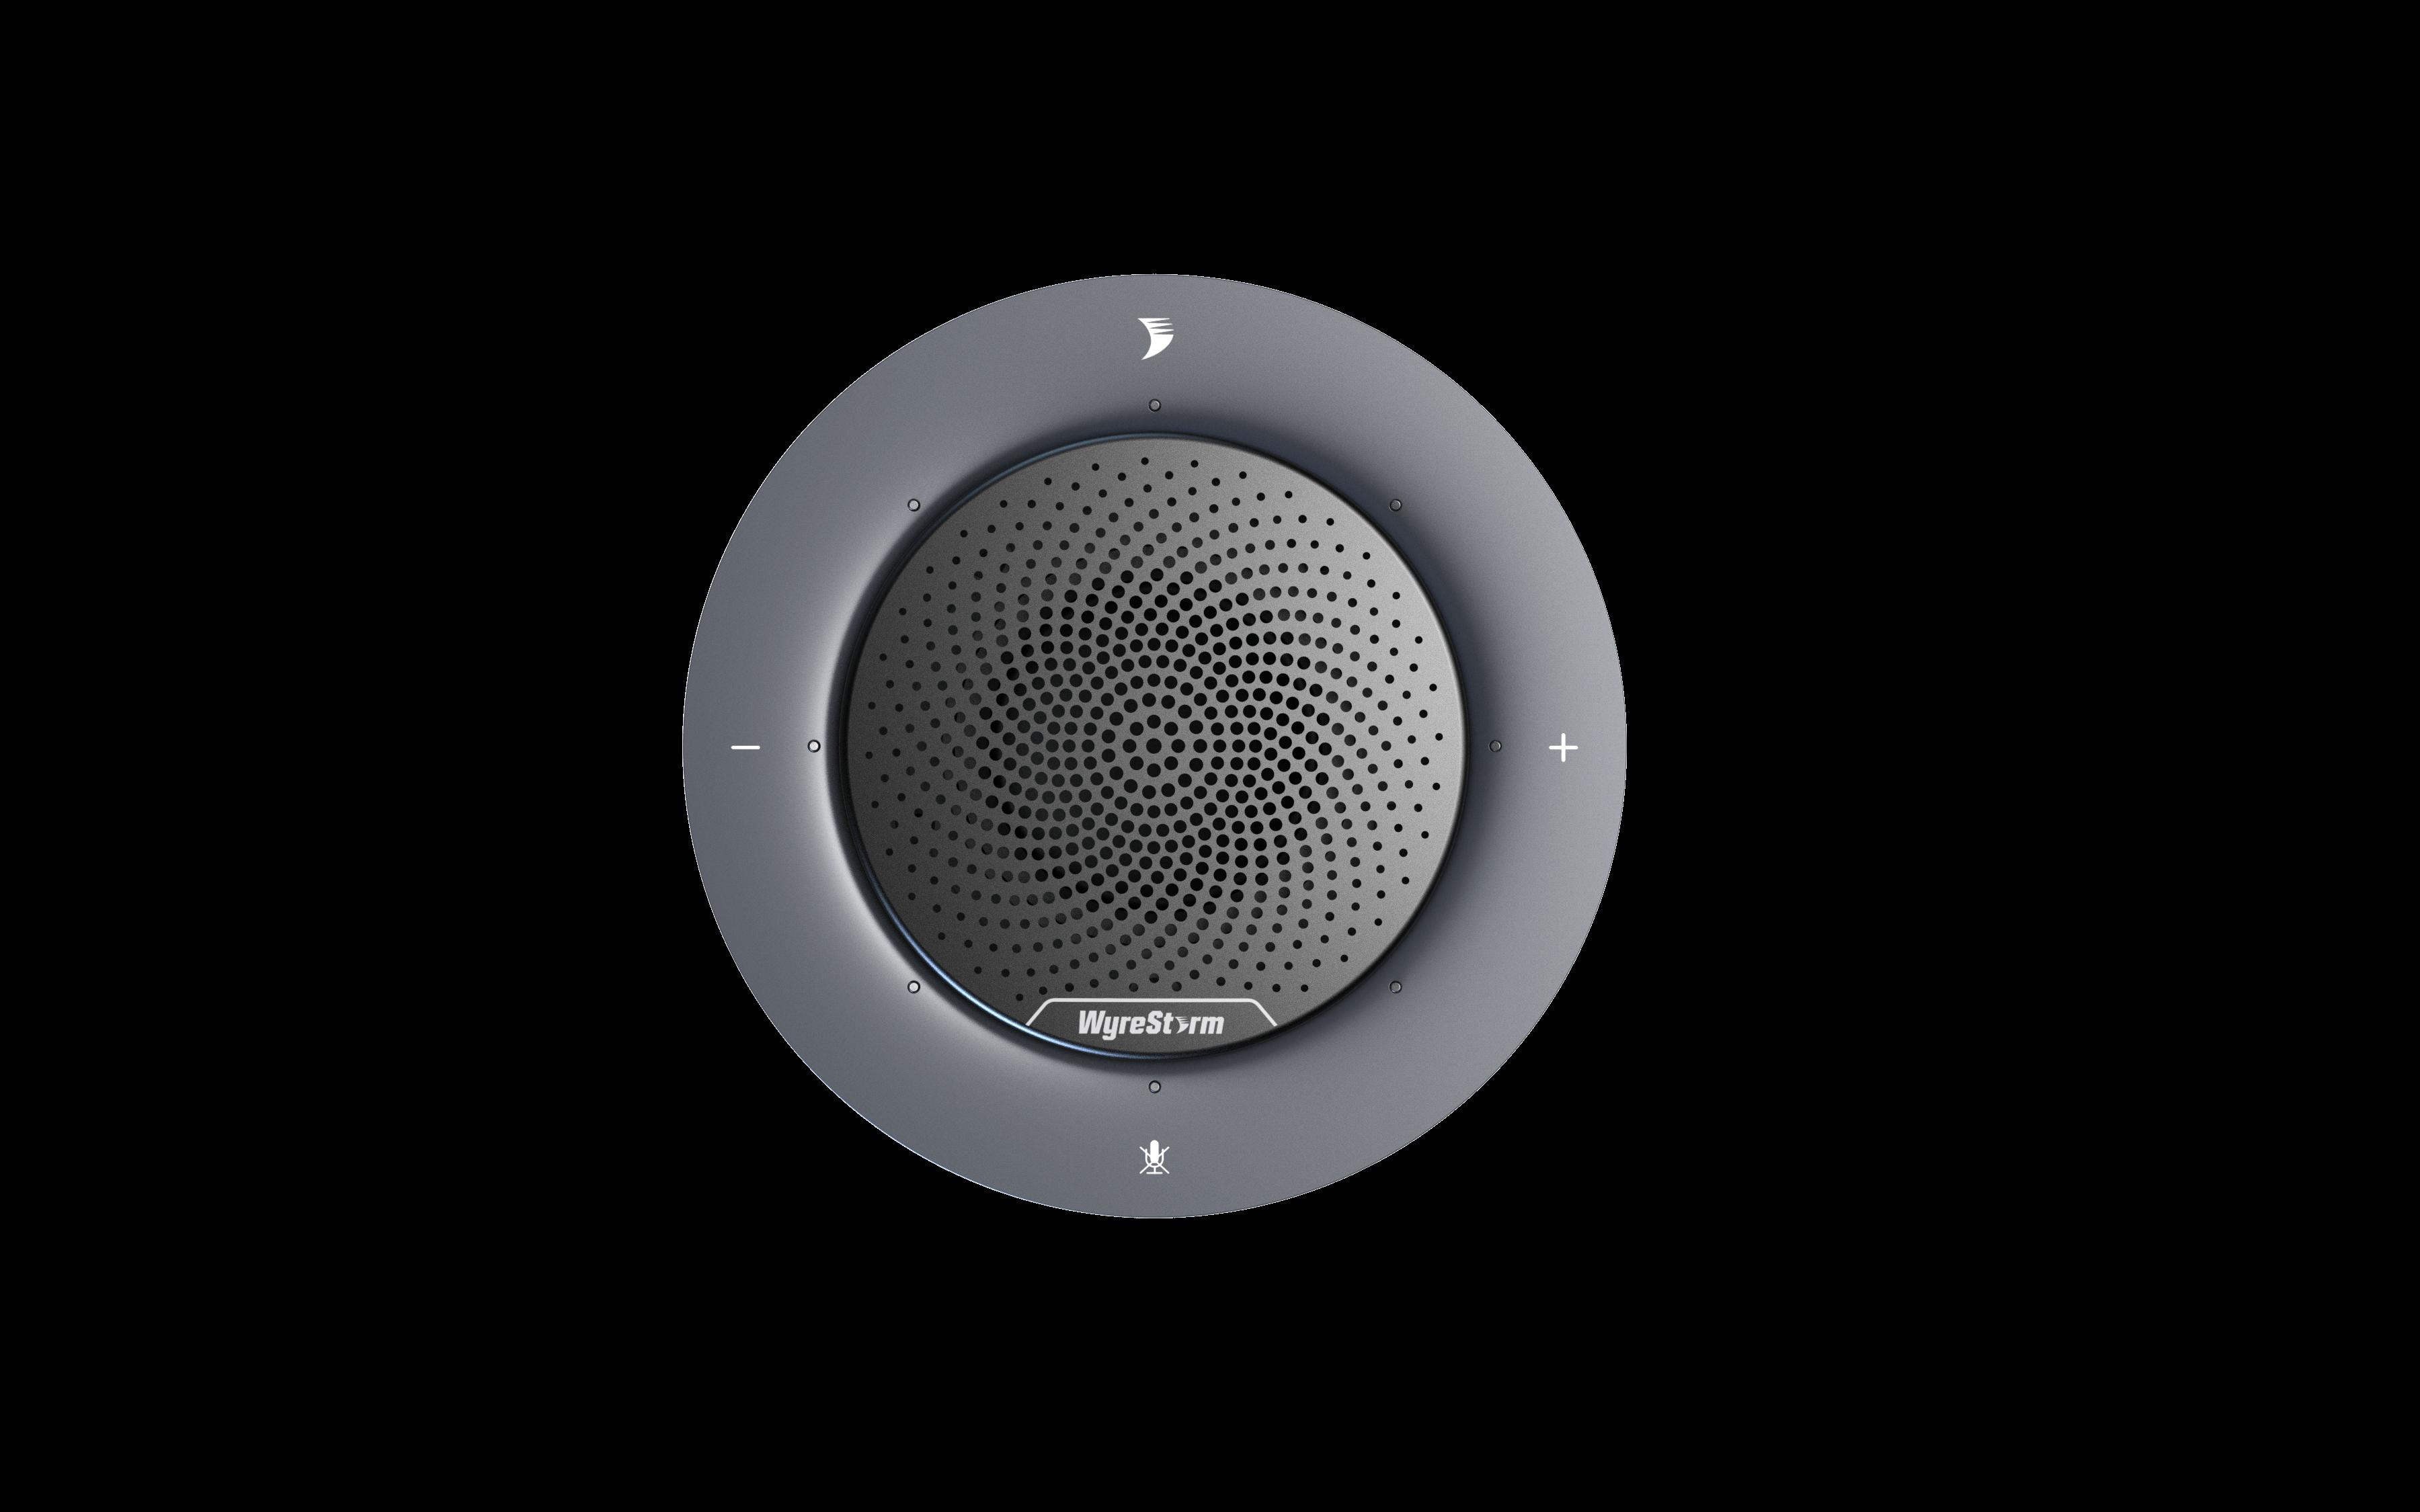 Wyrestorm-Speakerphone-Halo30